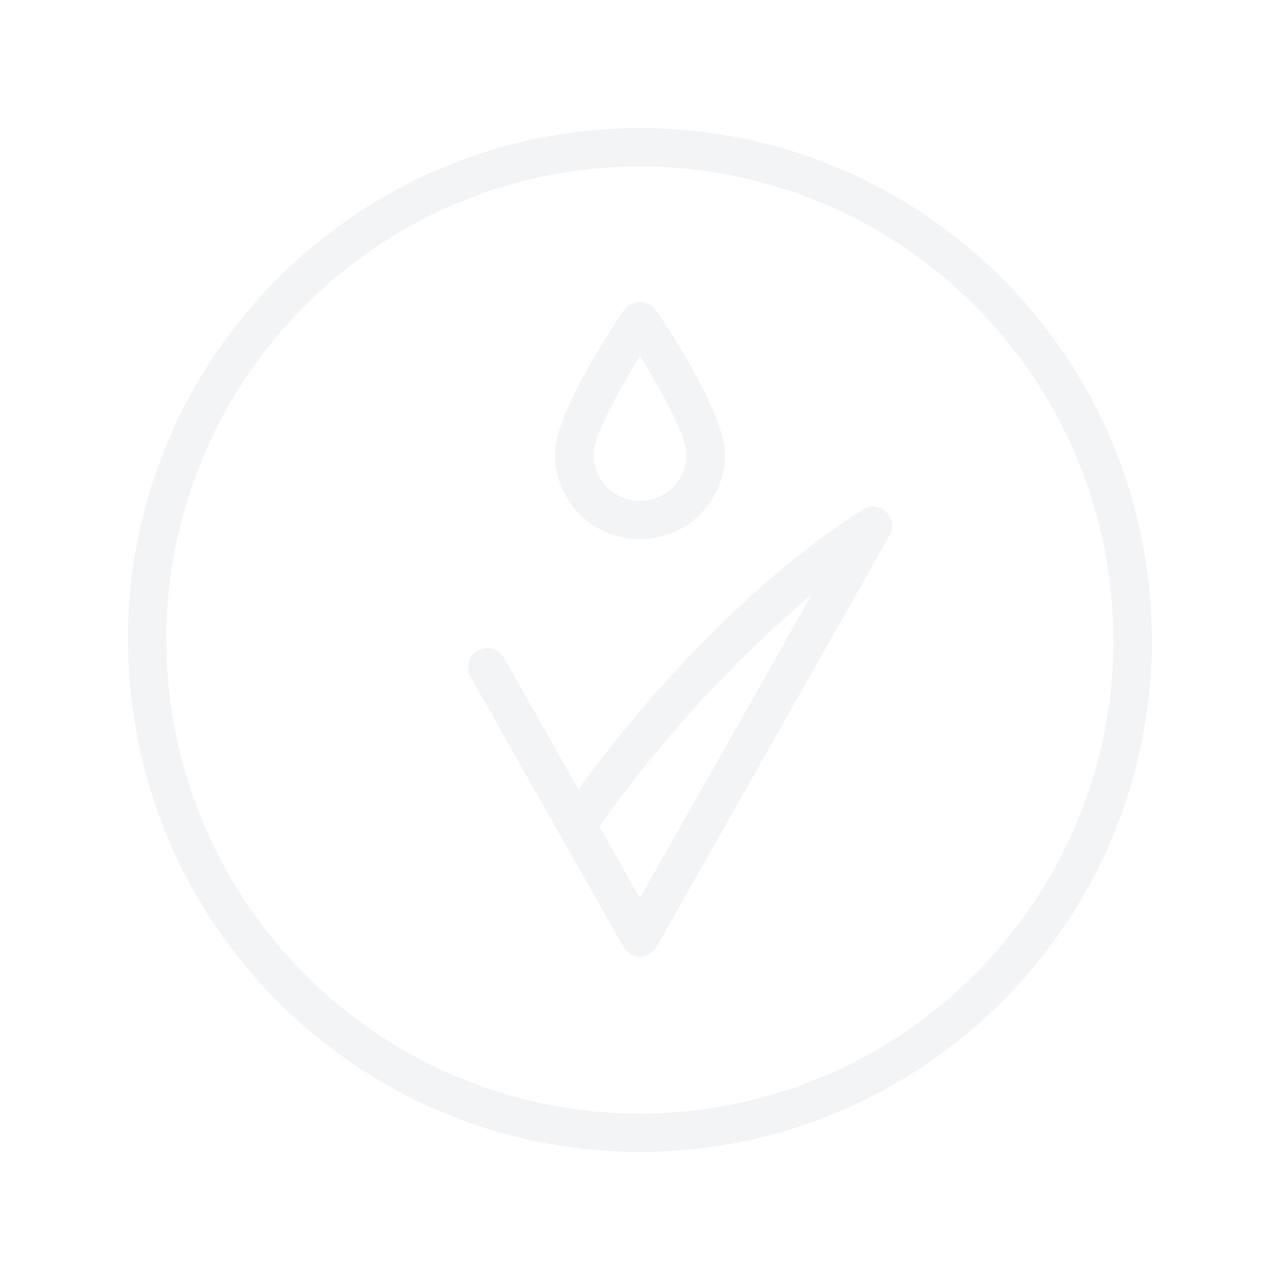 JOIK ORGANIC Moisturising Nail & Cuticle Oil 10ml